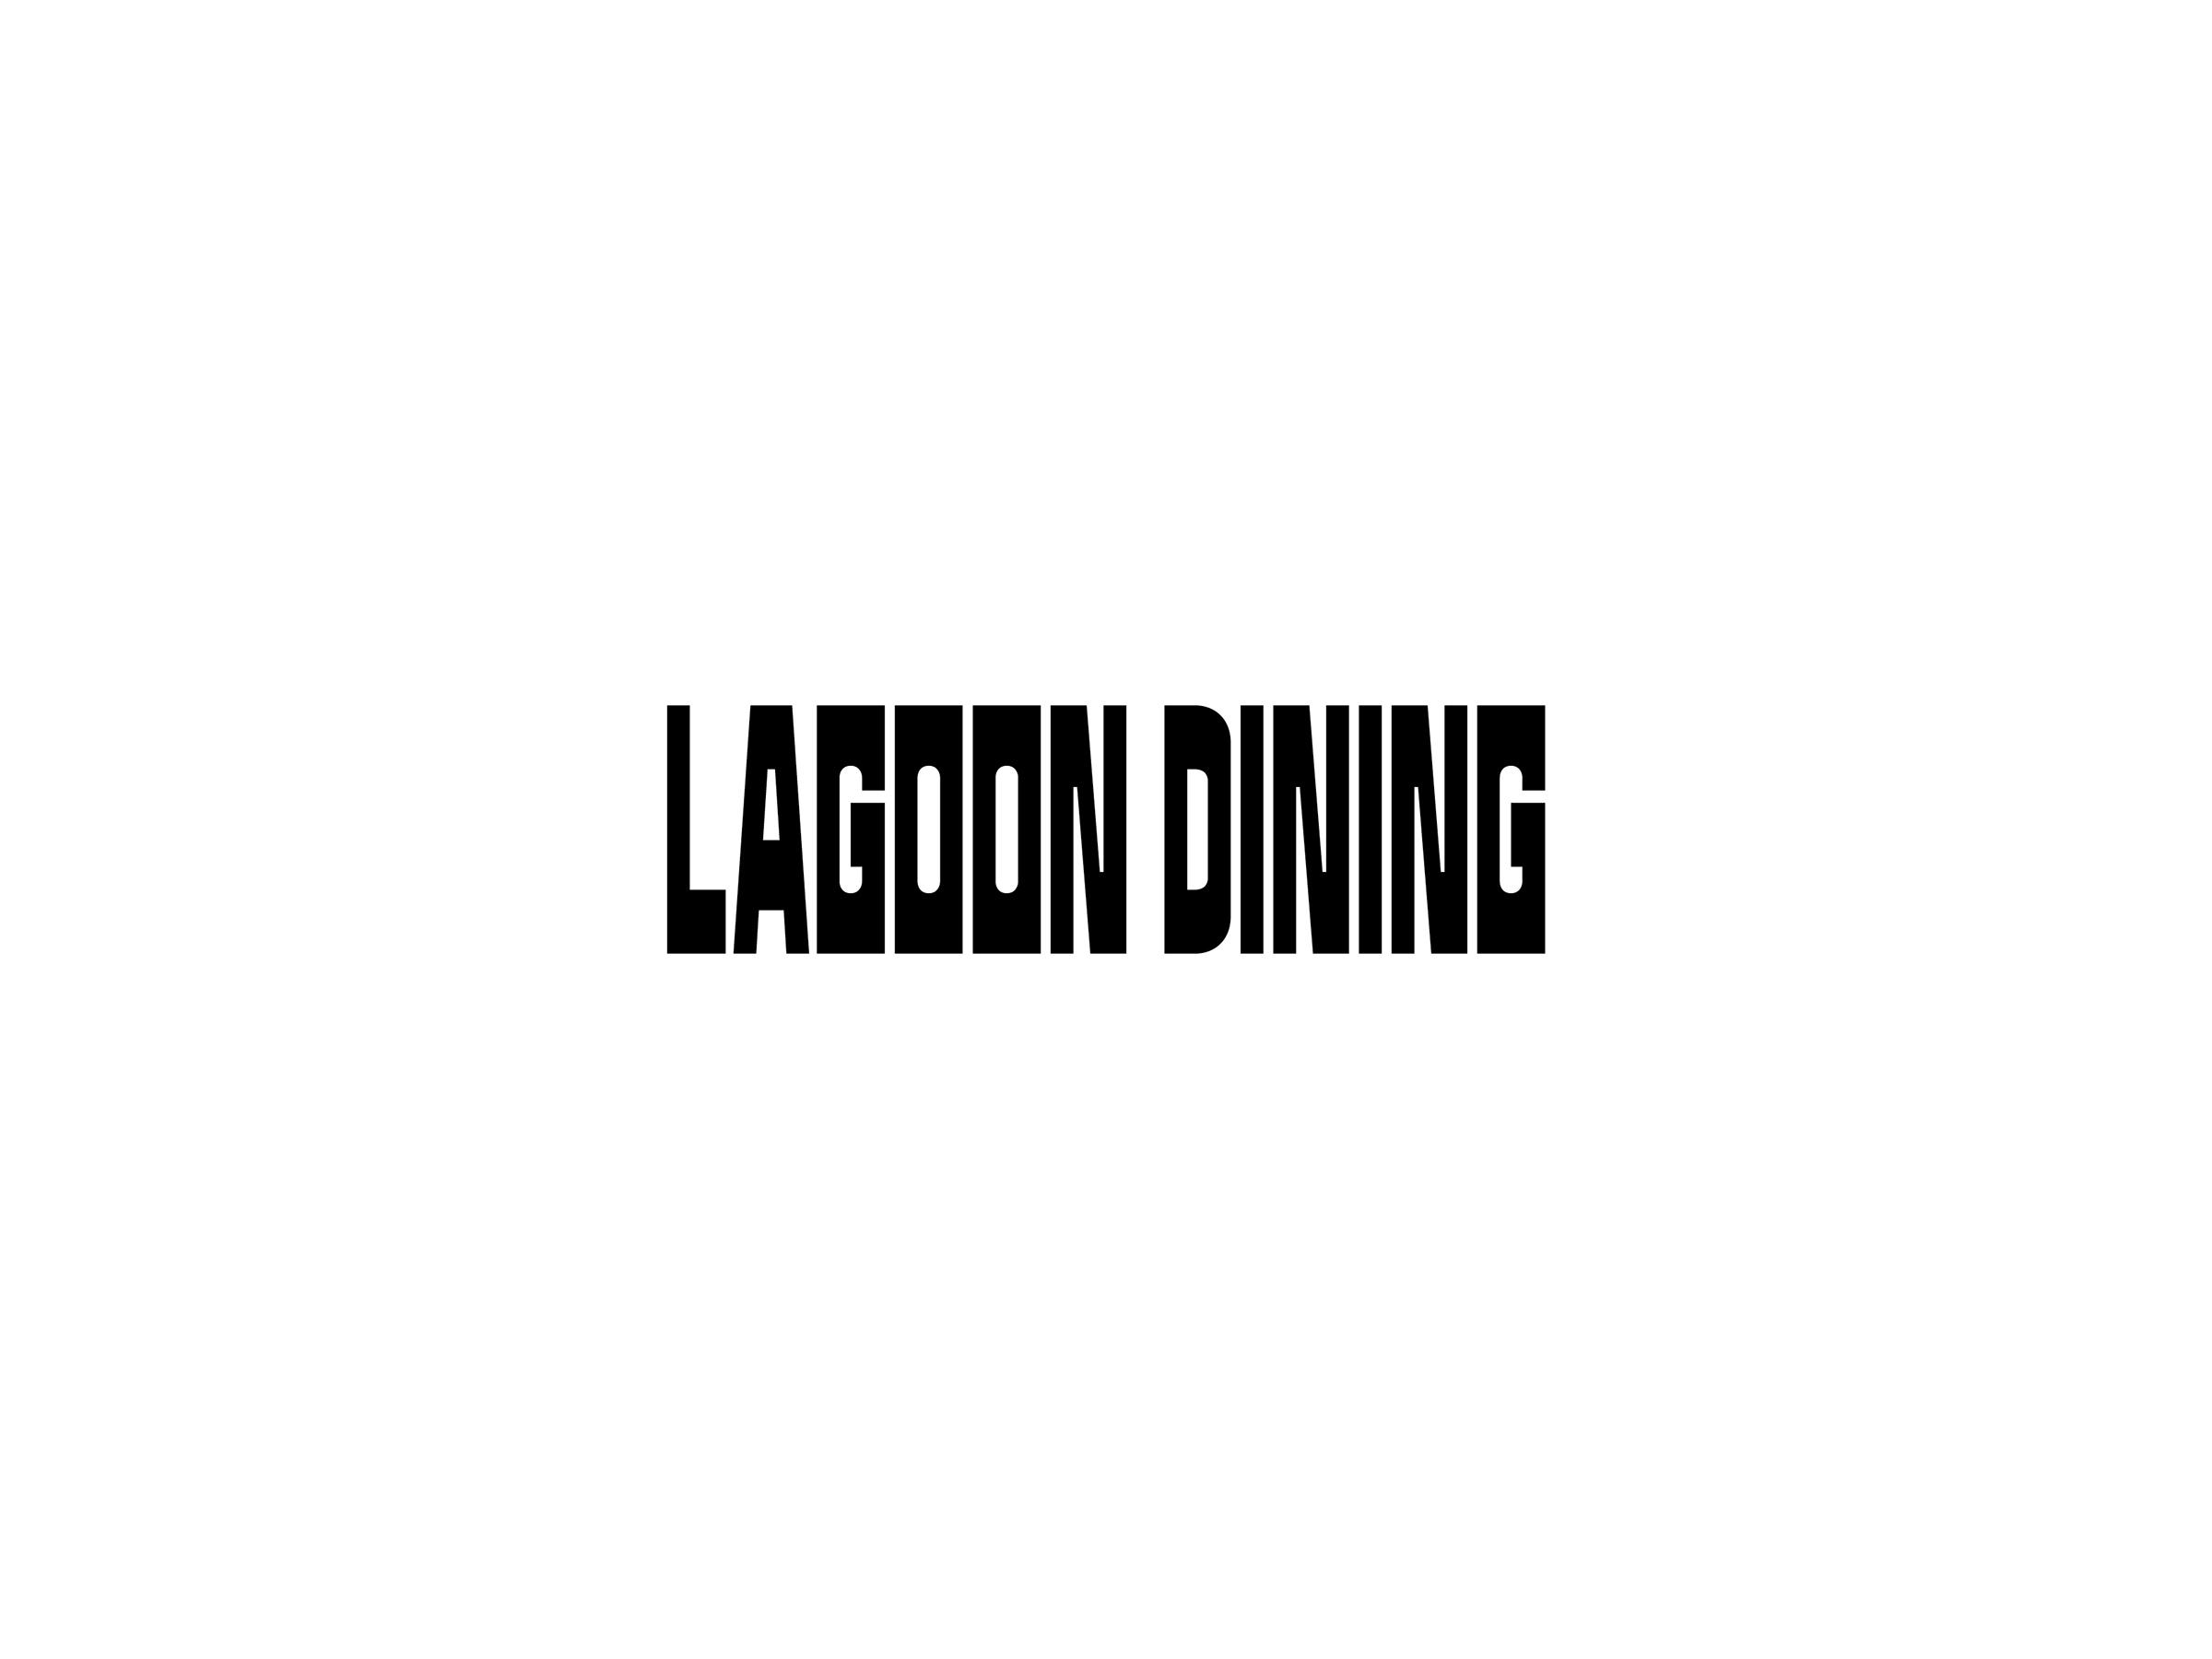 Lagoon Dining